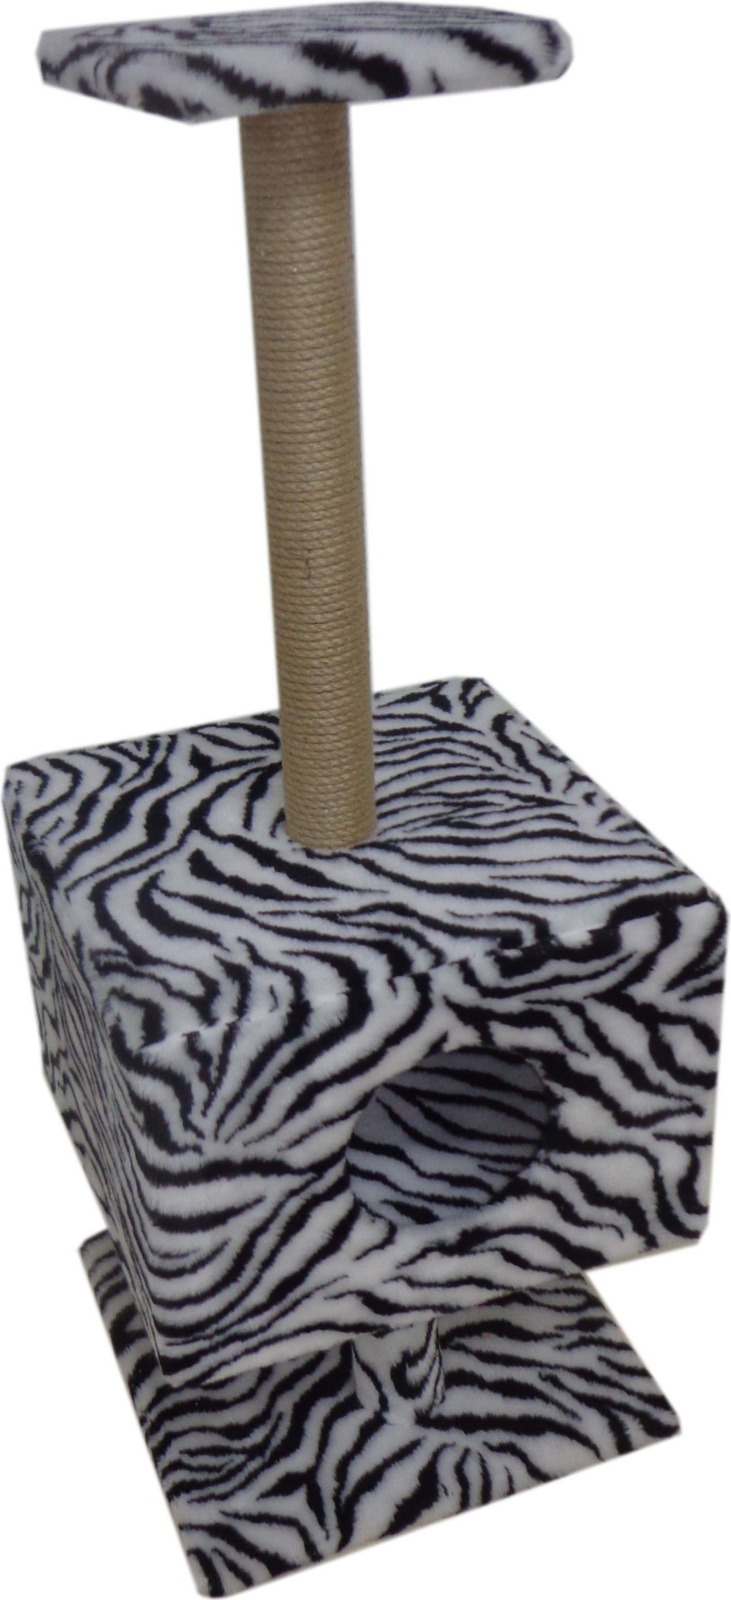 Домик для животных Меридиан Квадратный, Д 112 Зе, на подставке, зебра, 39 x 39 x 102 см домик когтеточка меридиан квадратный на подставке цвет леопардовый 39 х 39 х 102 см